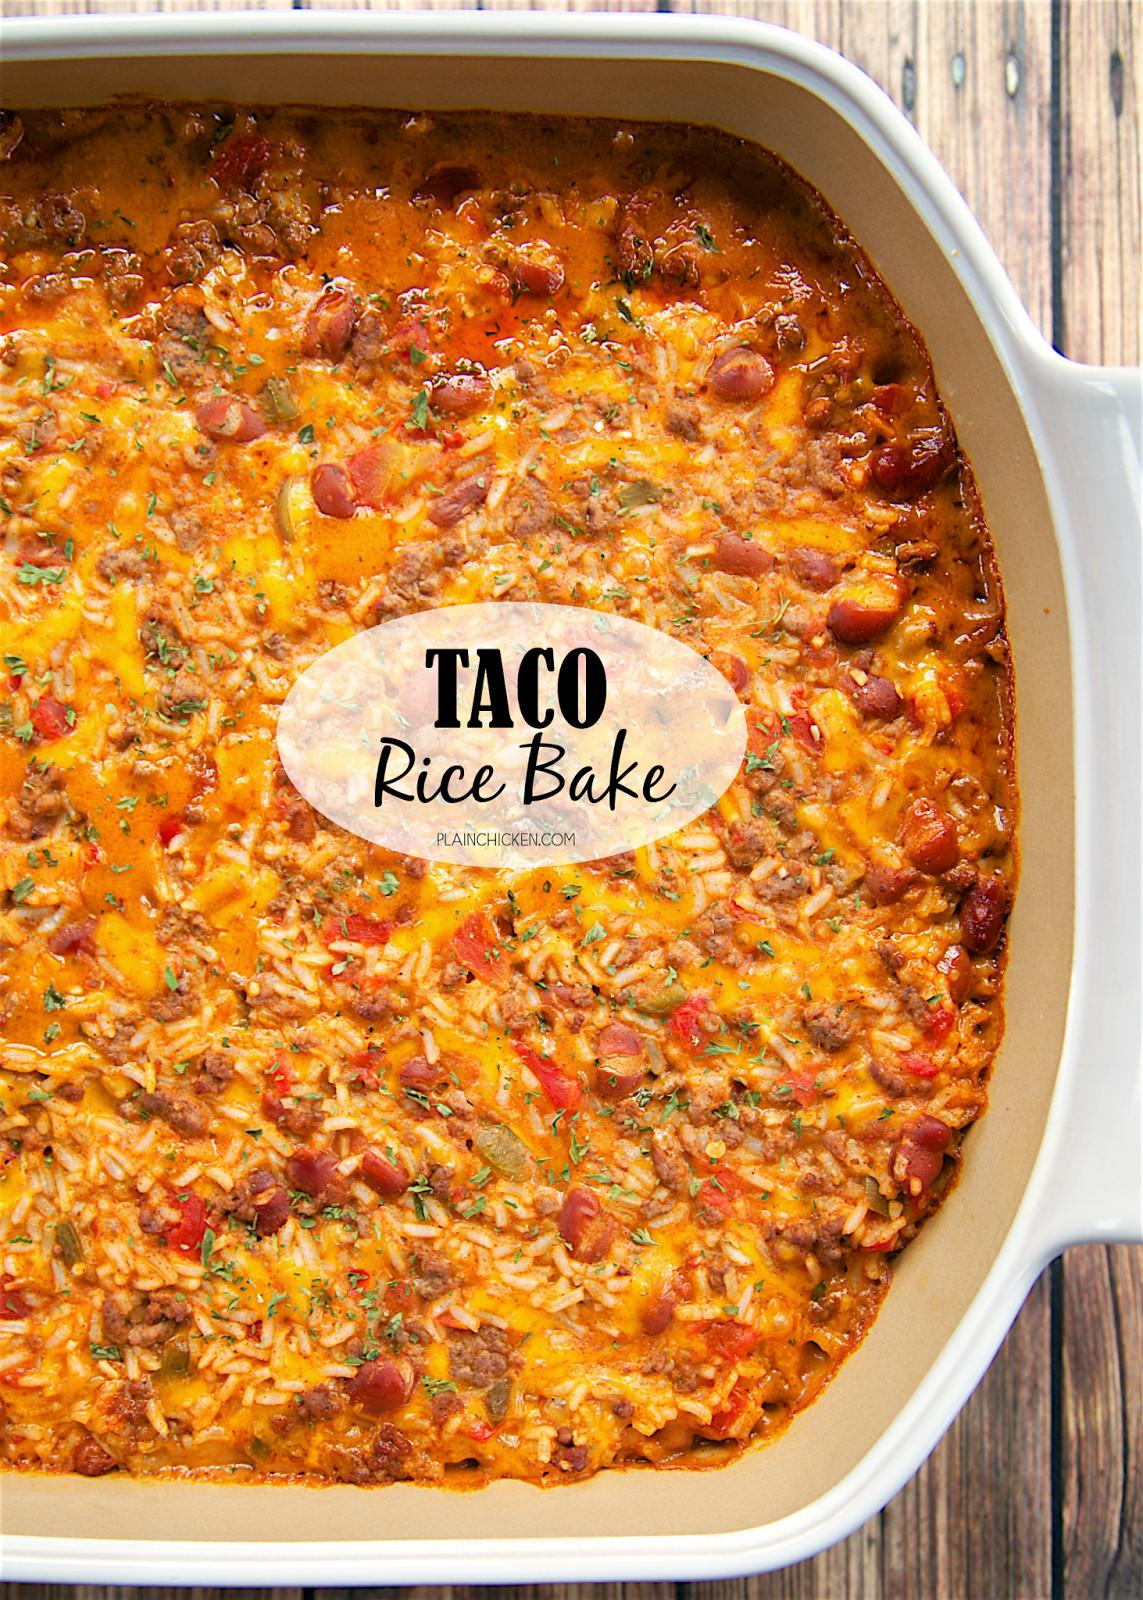 Taco Casserole With Rice  Taco Rice Bake